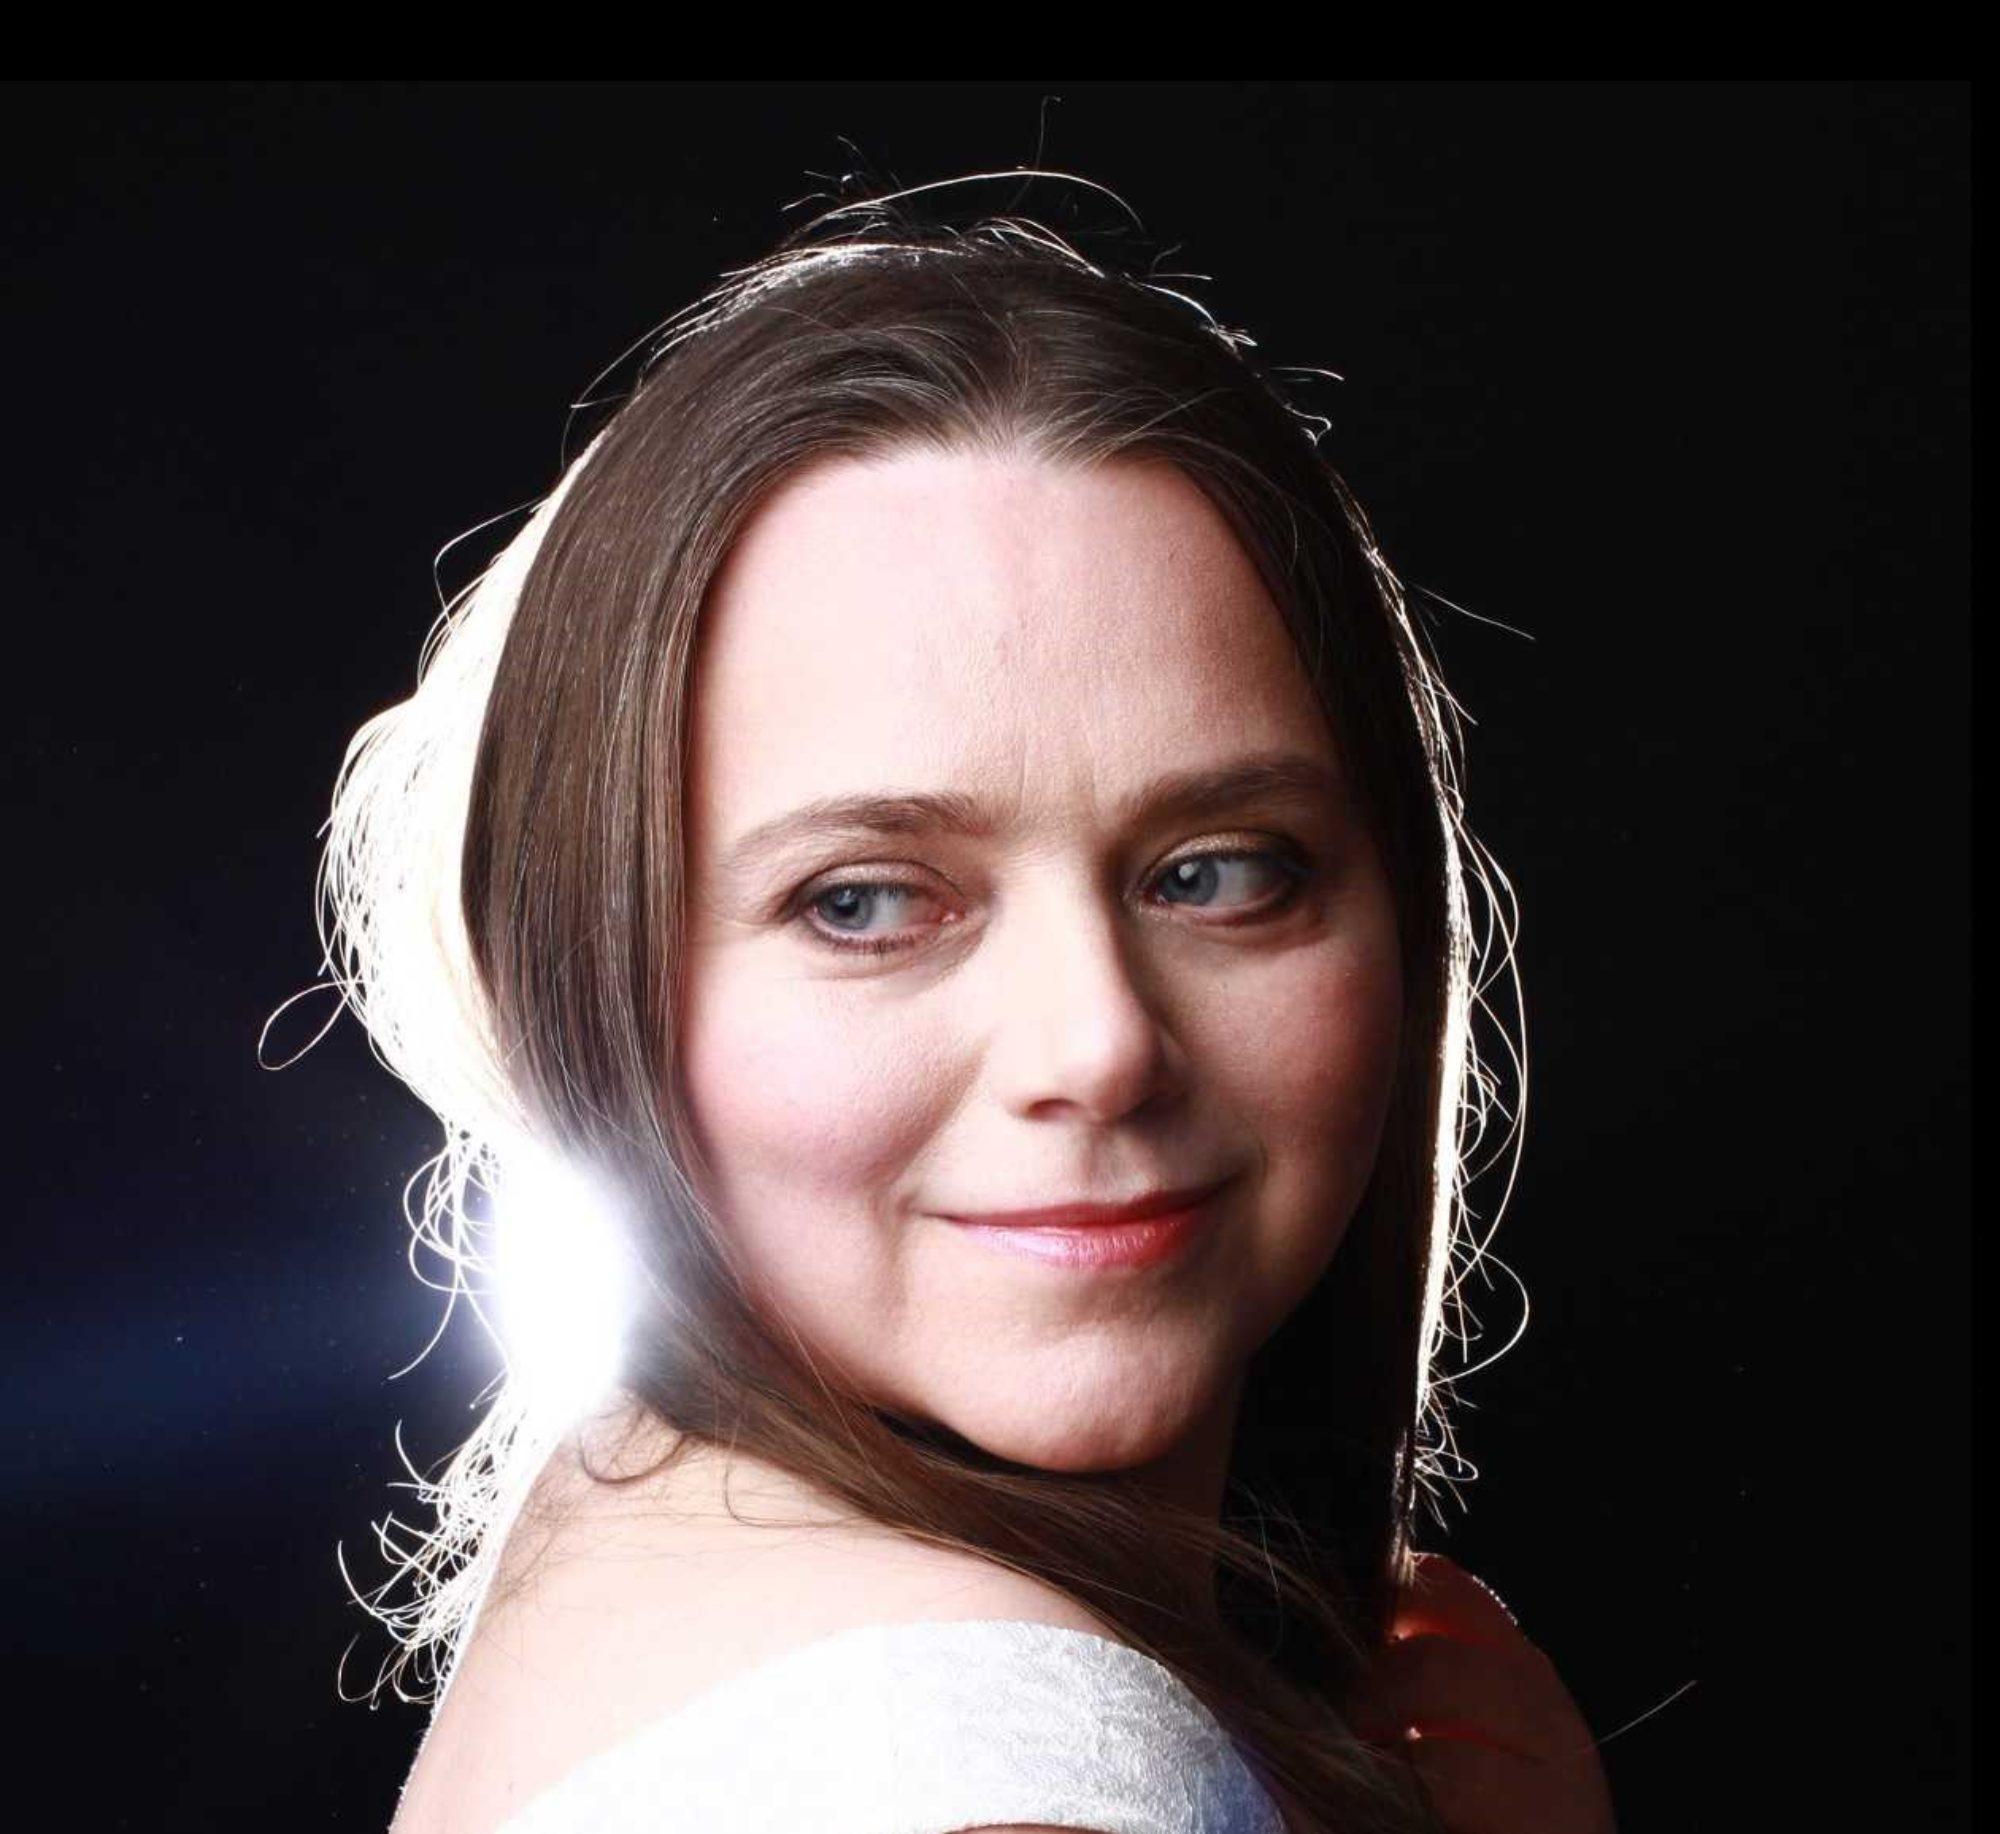 Sofie Björck